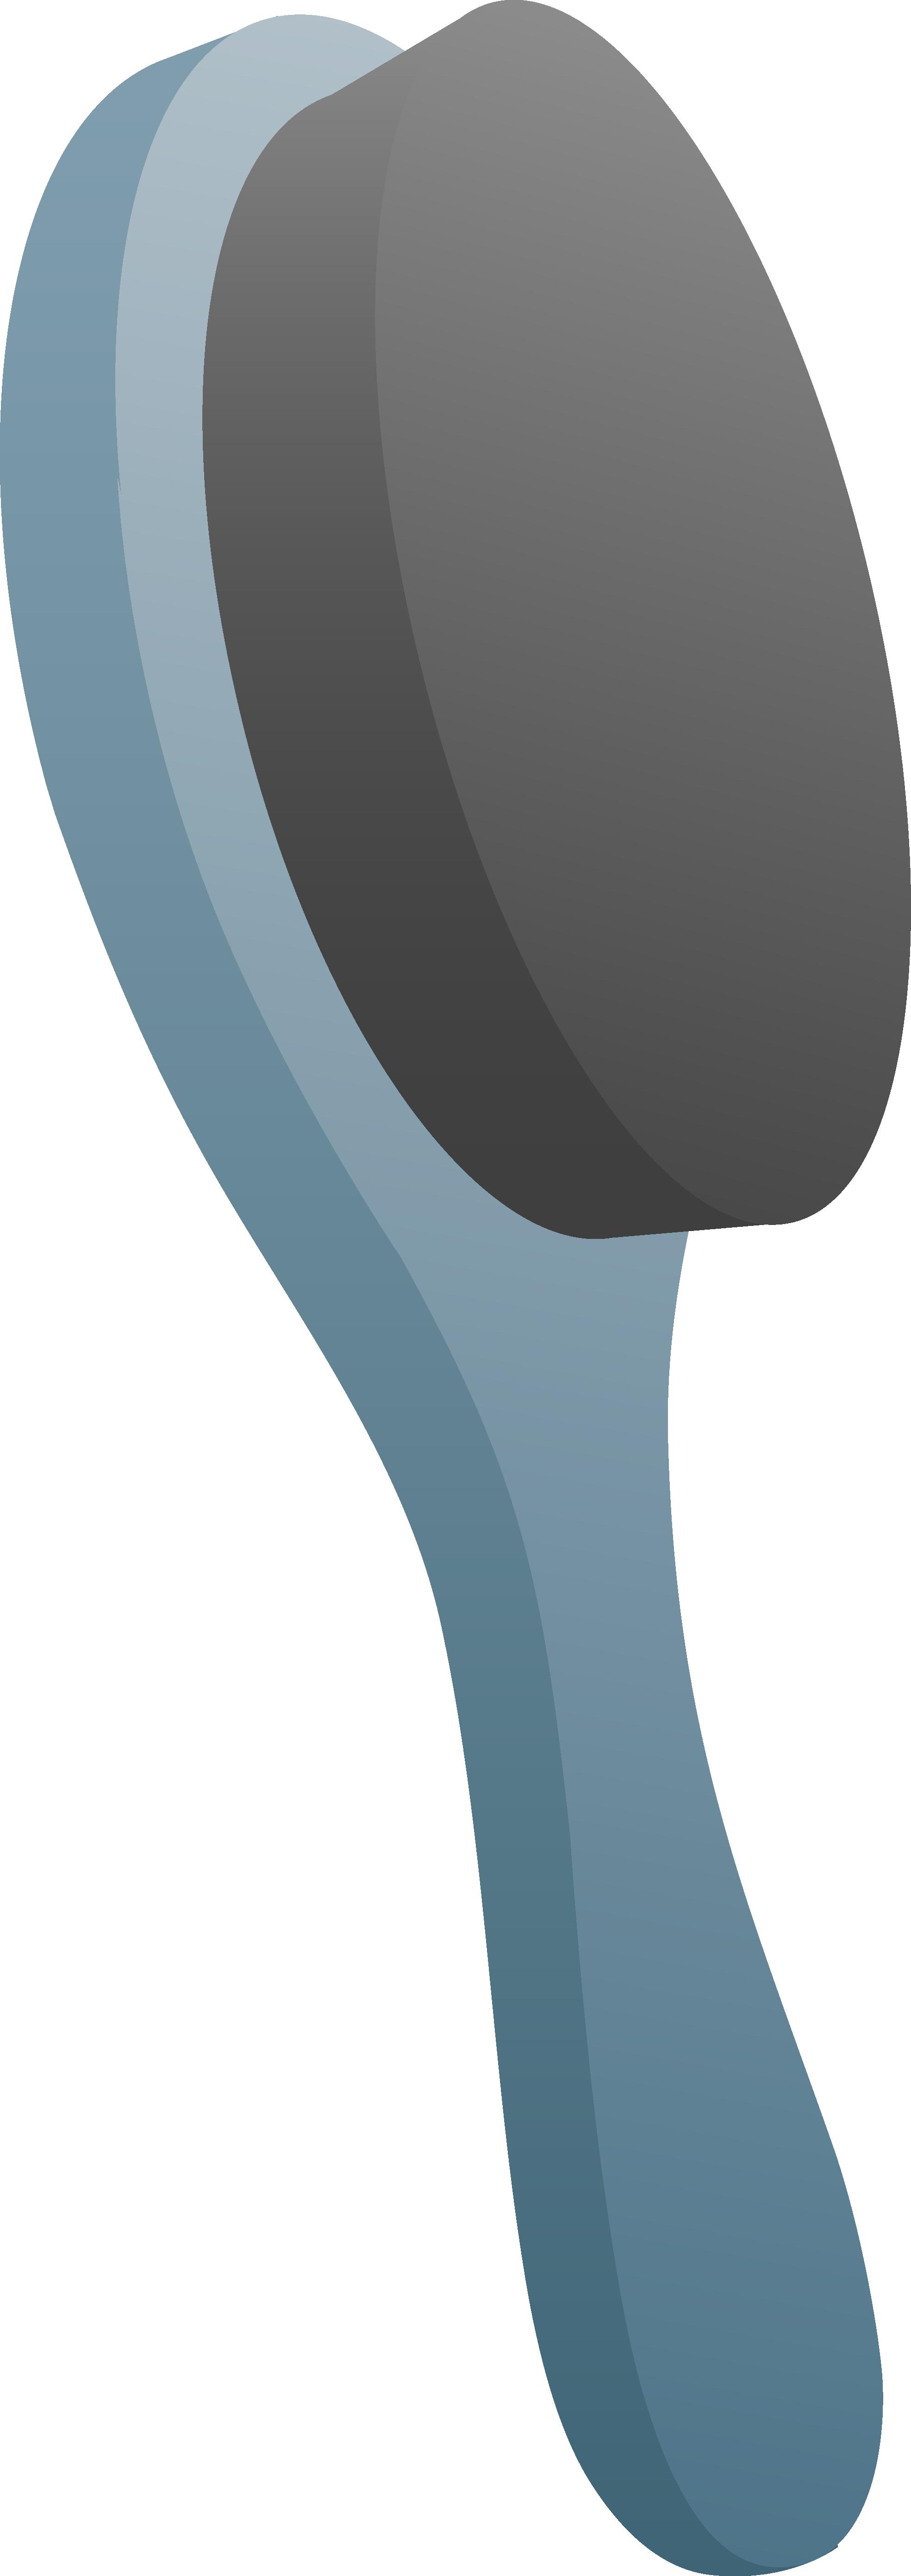 Blue soft hair brush. Comb clipart cartoon